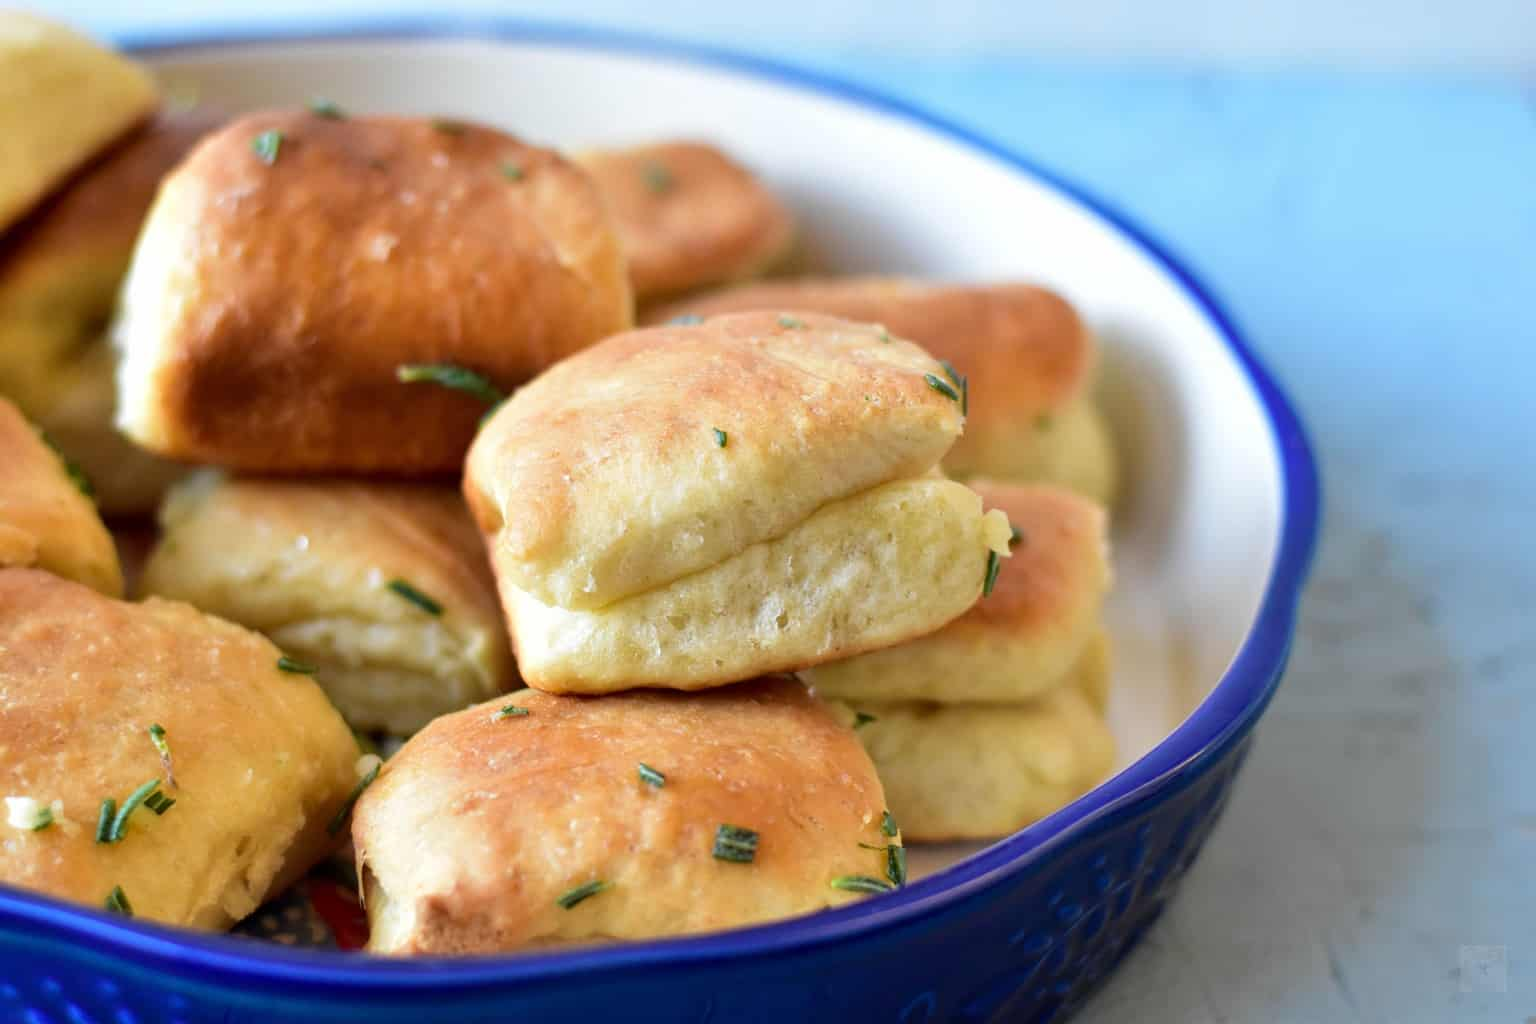 "<img src=""https://cdn.shortpixel.ai/client/q_glossy,ret_img,w_4096,h_2730/Garlic Rosemary Parker House Dinner Rolls.jpg"" alt=""Garlic Rosemary Parker House Dinner Rolls"">"